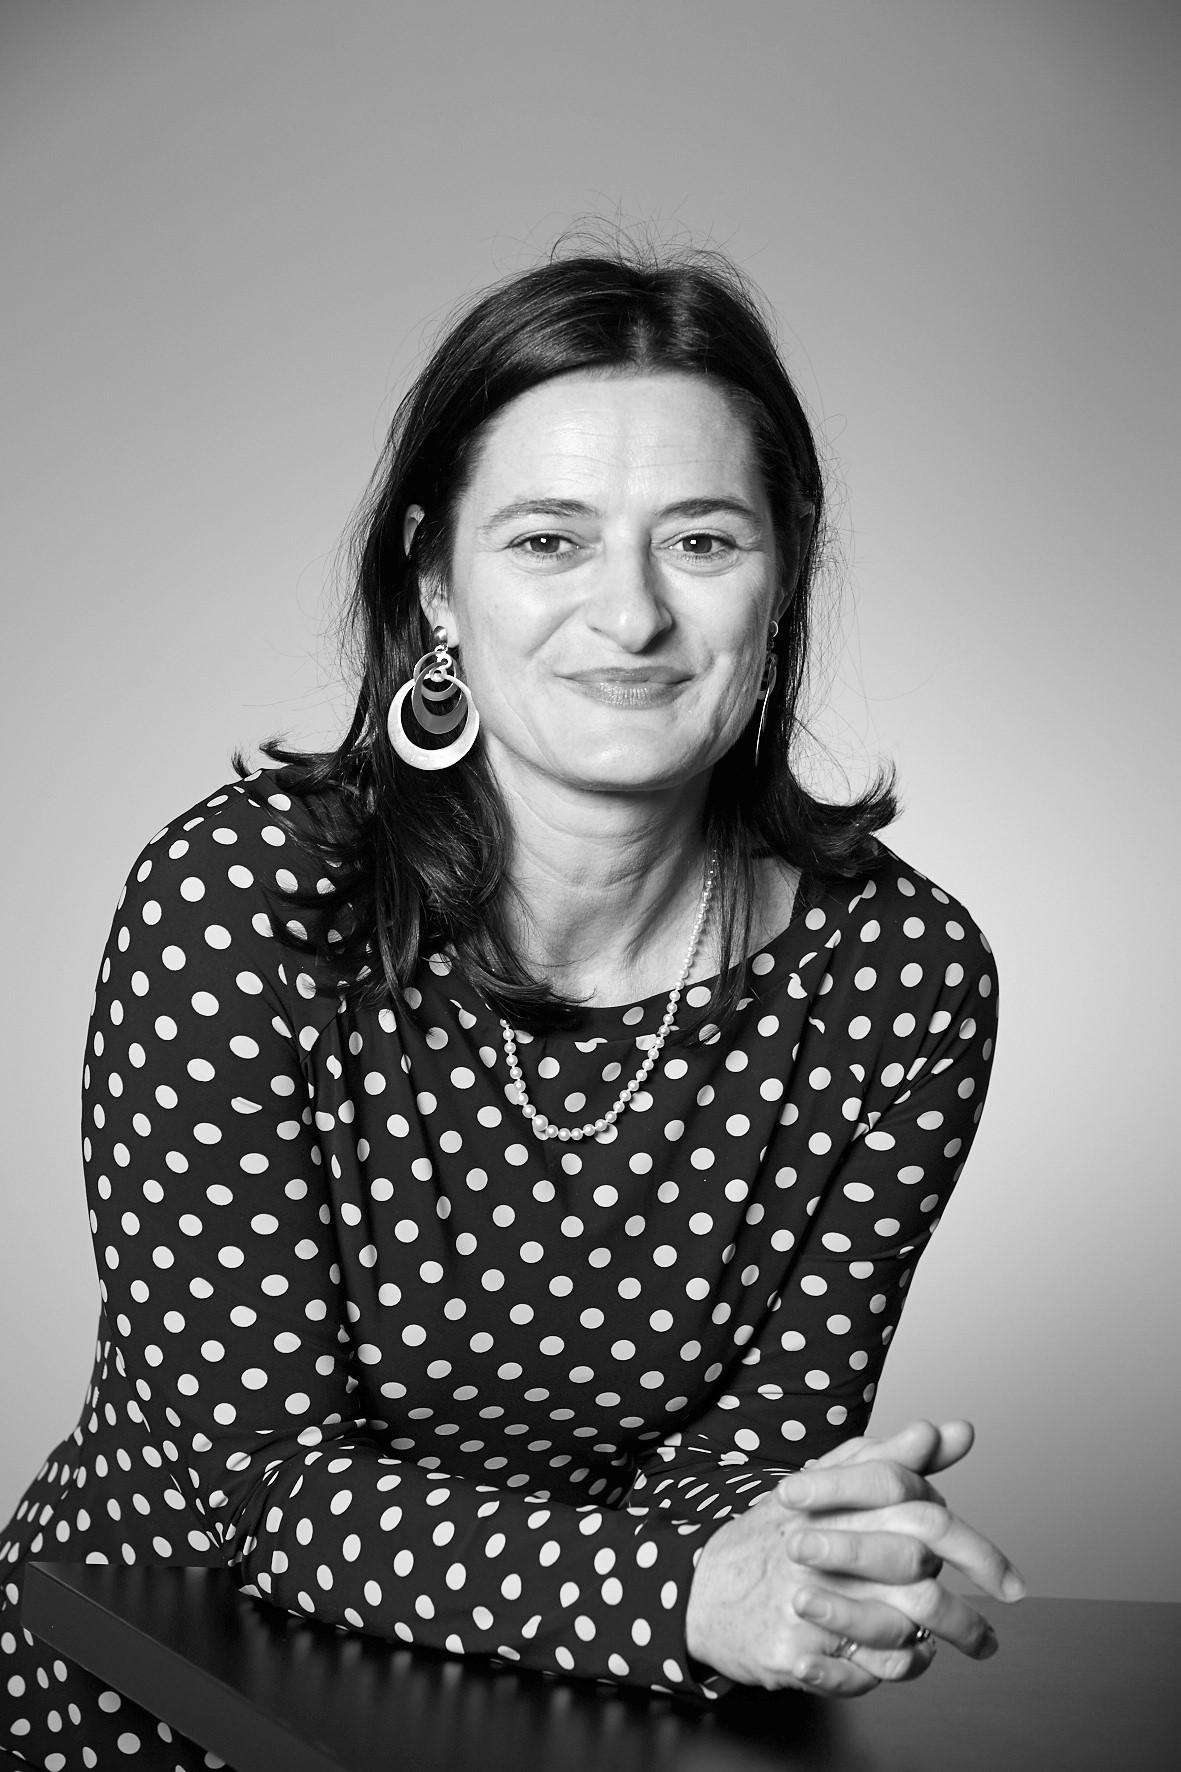 Iris Podgorschek